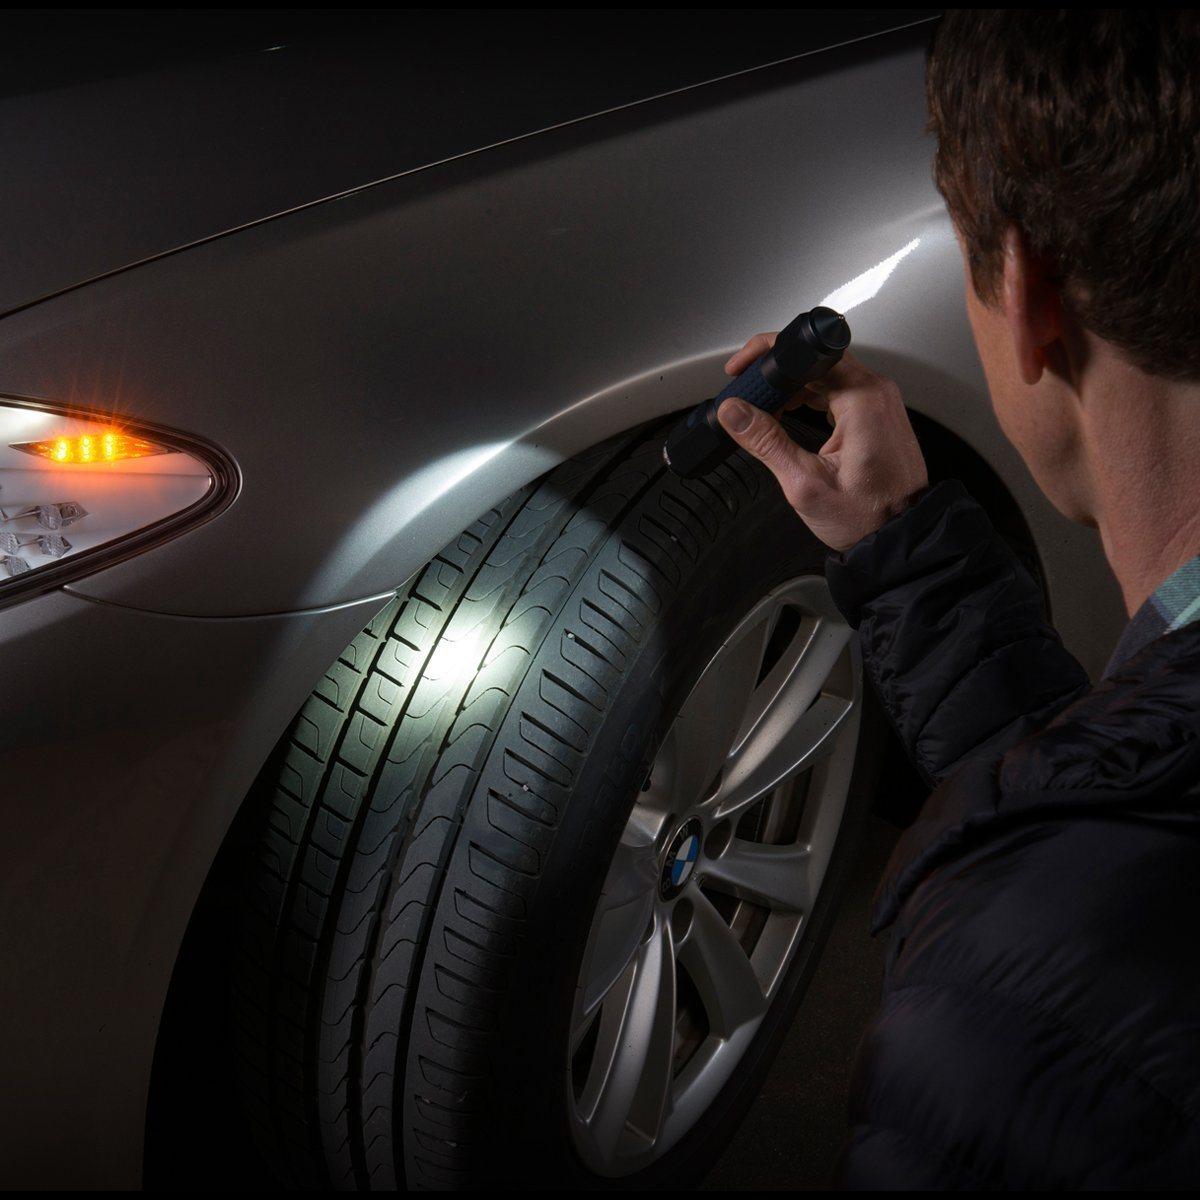 3 in 1 Car Emergency Tool with Rescue Seat Belt Cutter Escape Window Breaker Survival LED Flashlight